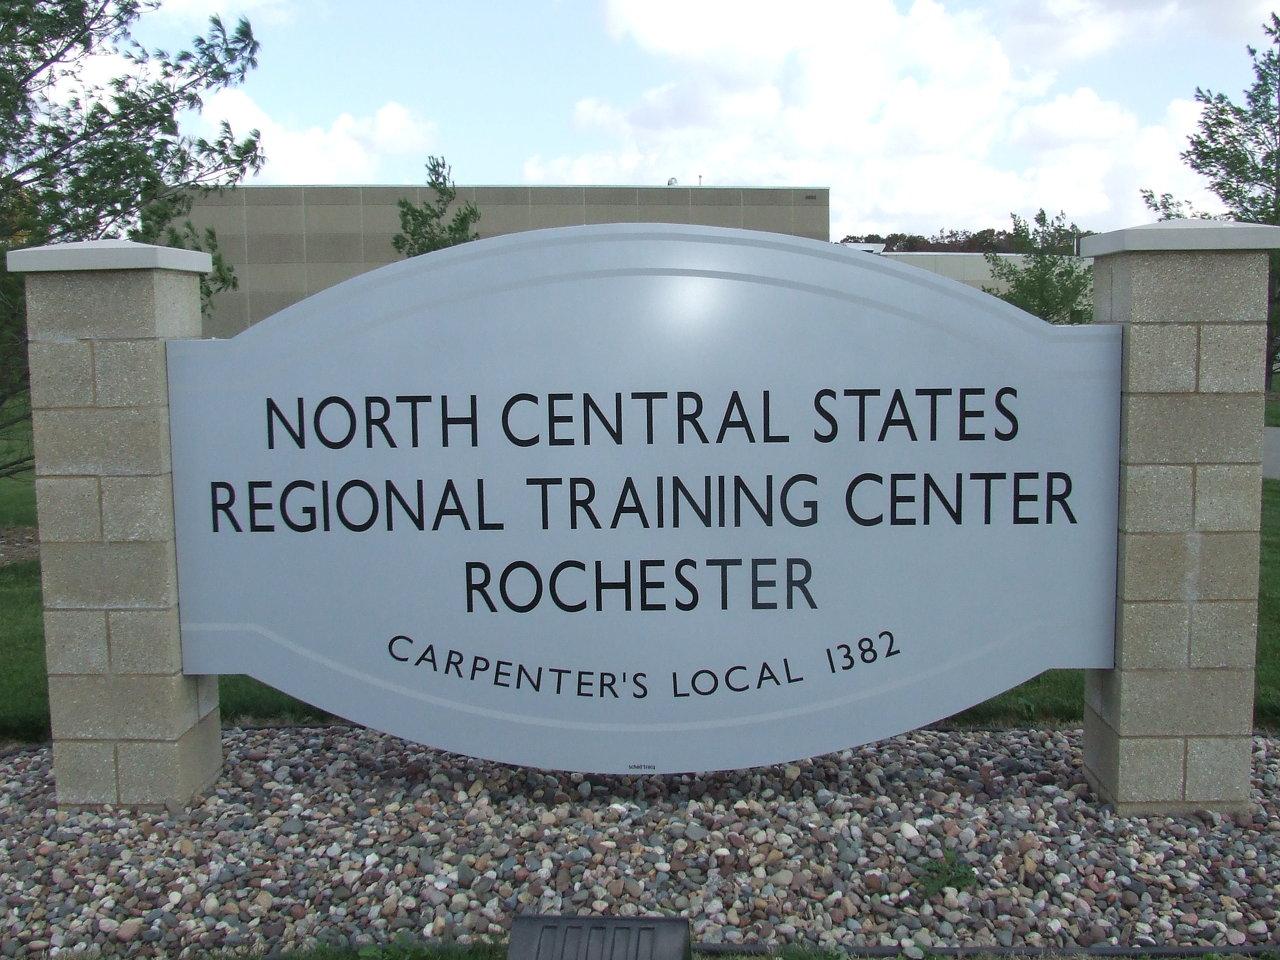 NCSRCC training center sign